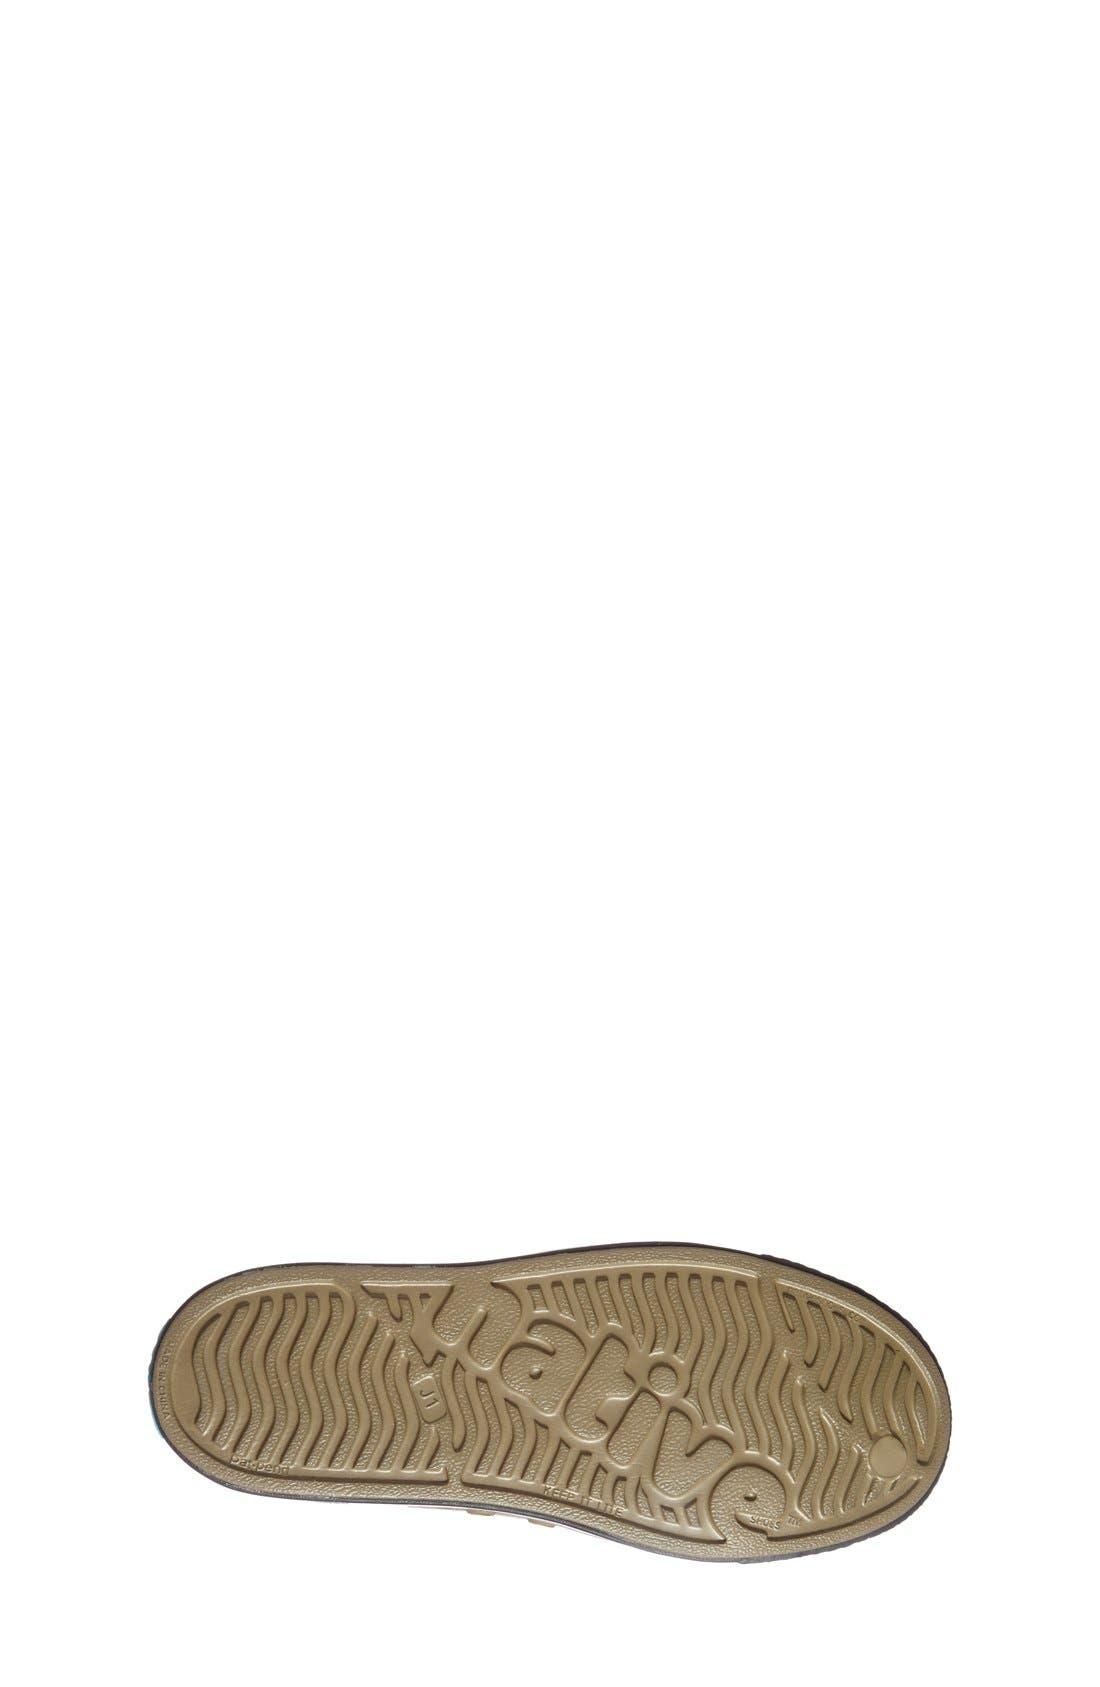 'Jefferson' Water Friendly Slip-On Sneaker,                             Alternate thumbnail 198, color,